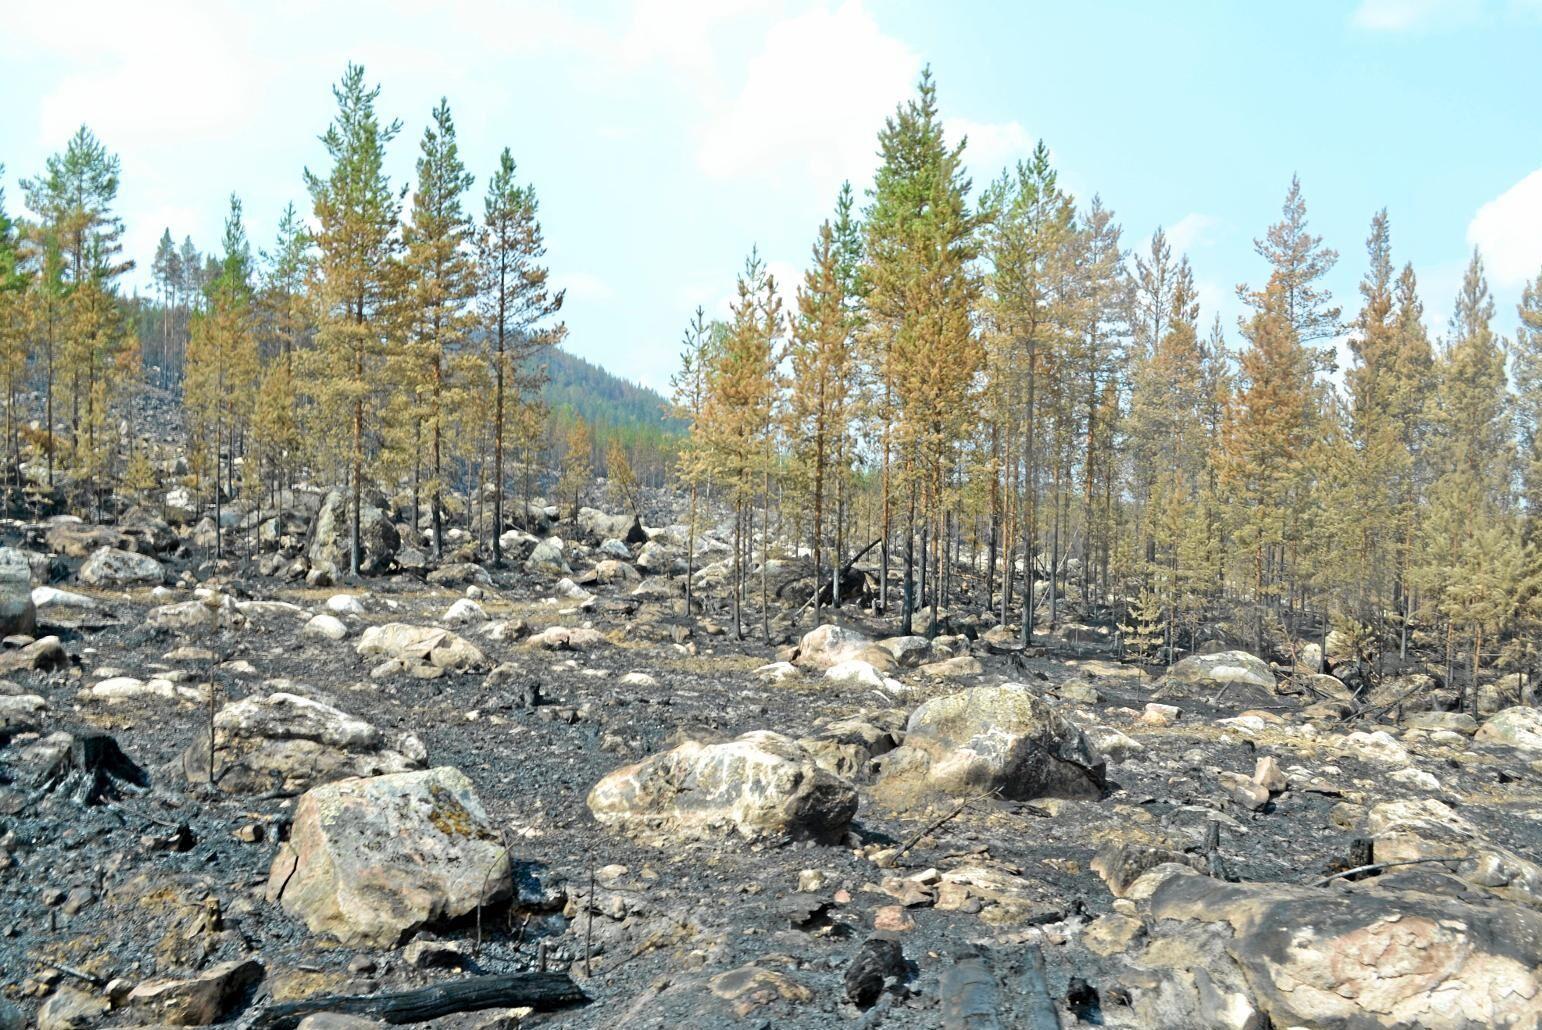 Bränd skogsmark i Ljusdal.